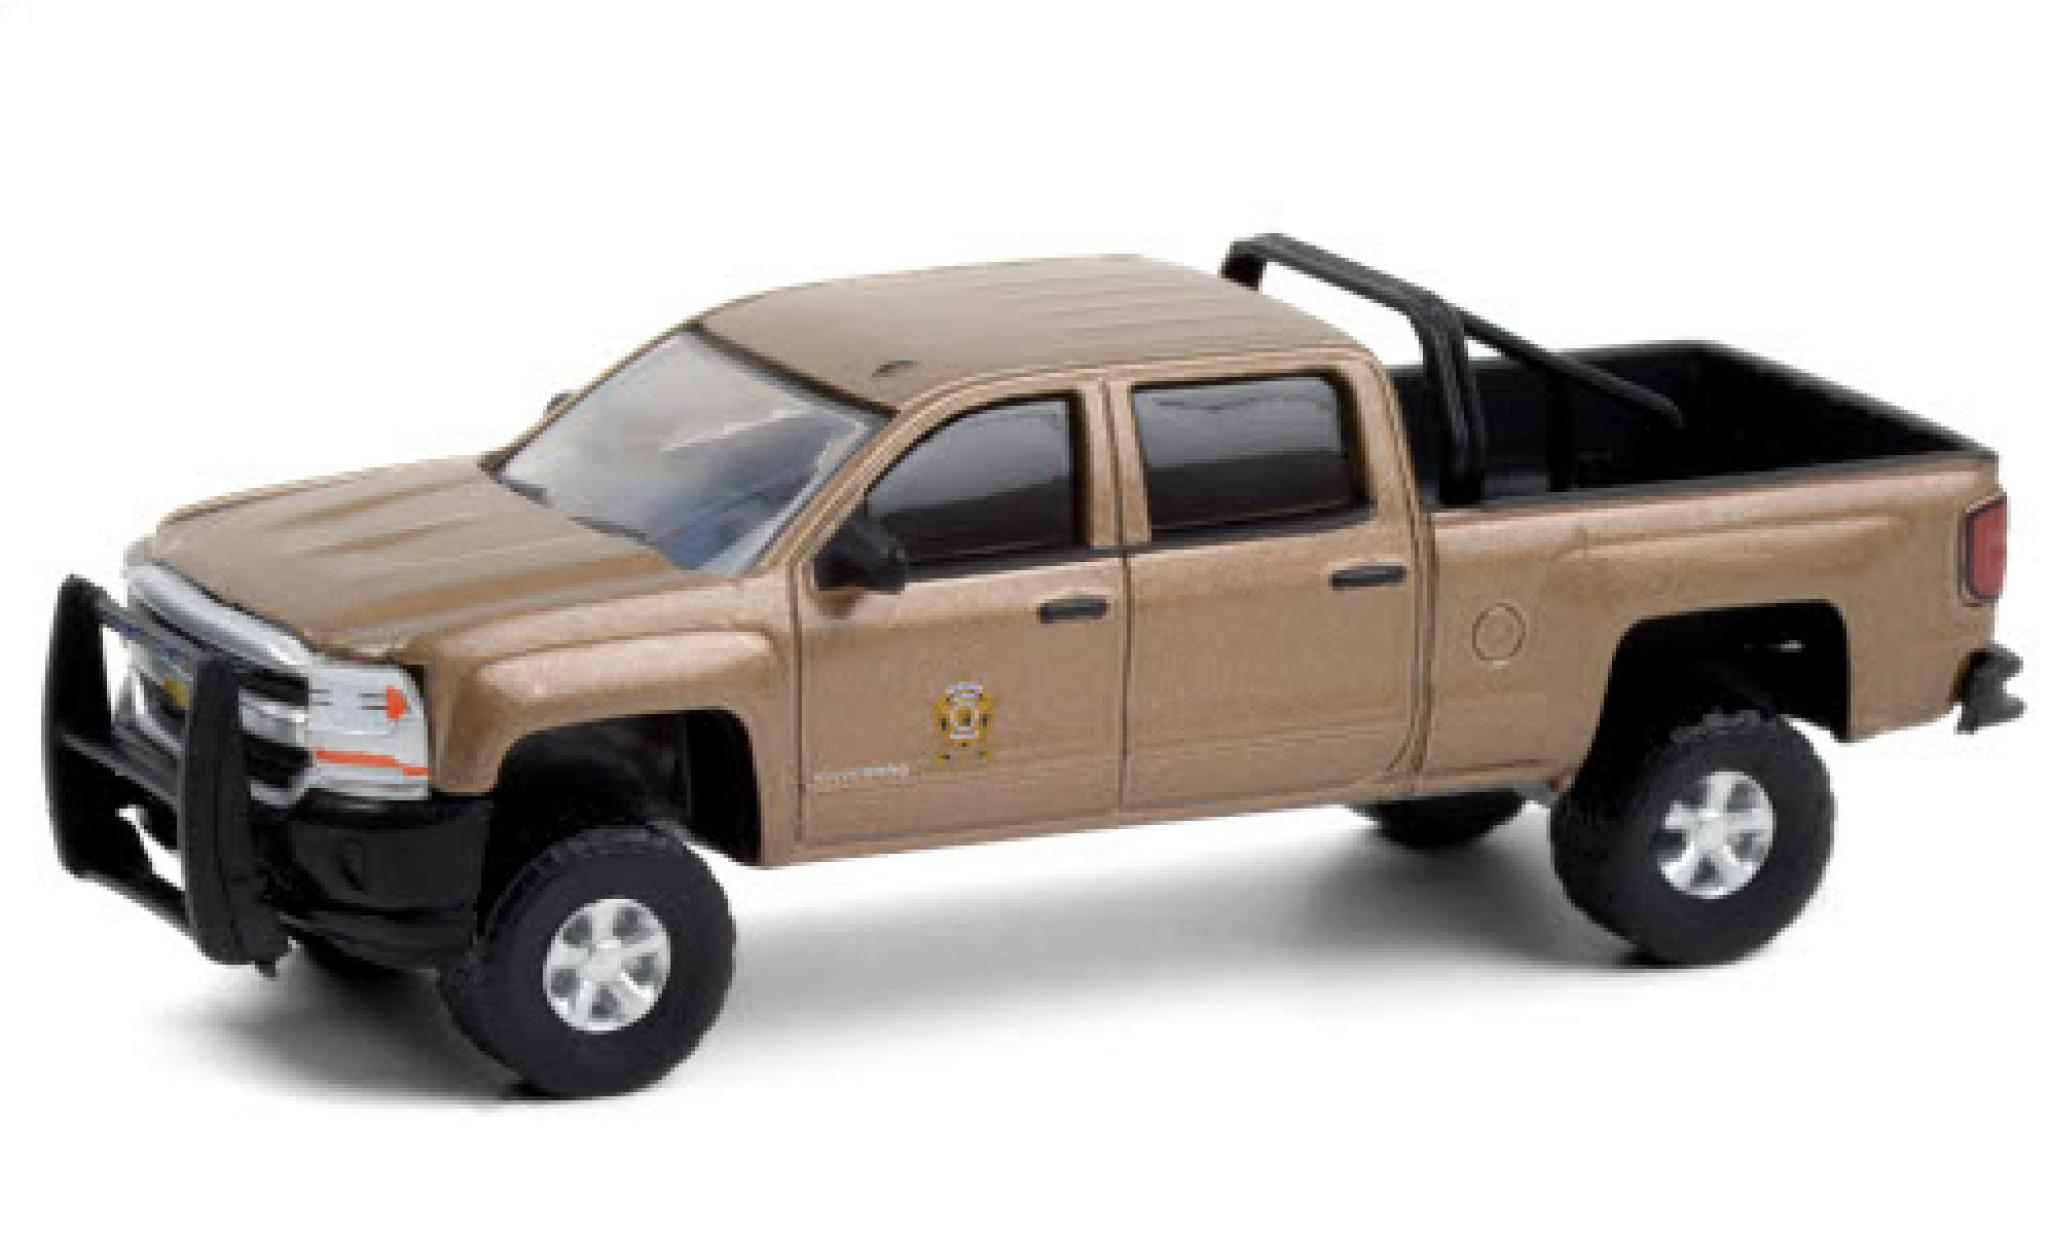 Chevrolet Silverado 1/64 Greenlight 1500 Washington State Police 2017 Departement of Poisson and Wildlife